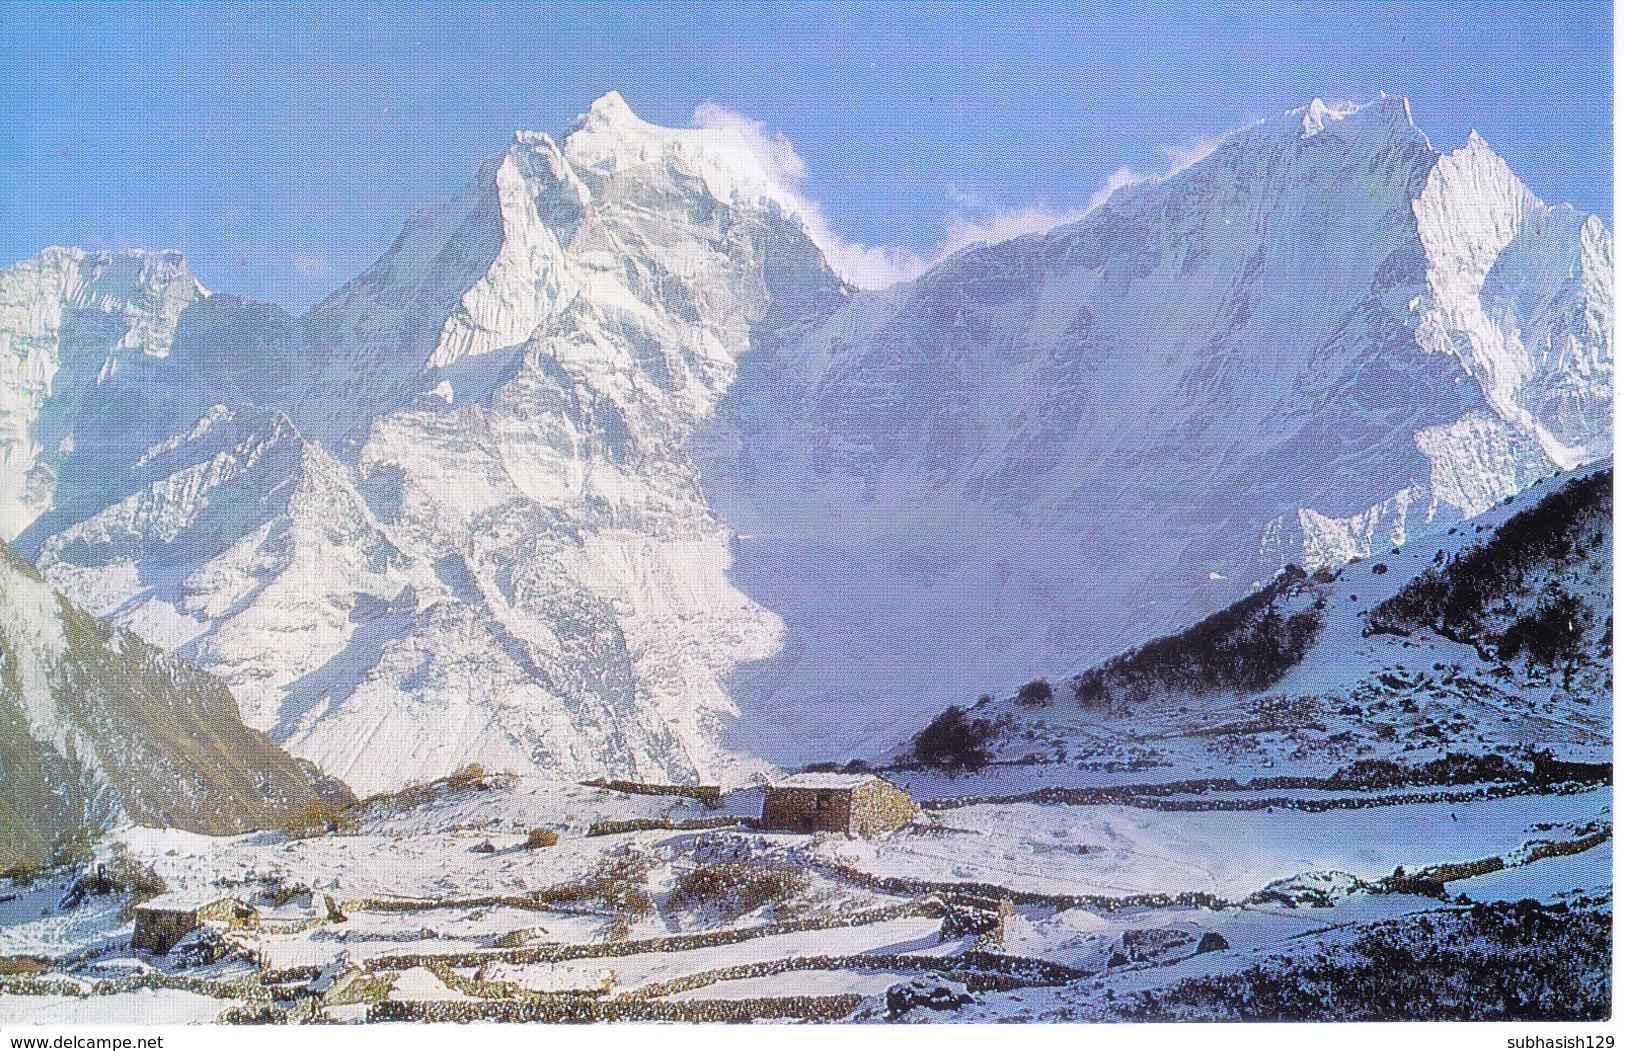 NEPAL - COLOUR PICTURE POST CARD - PEAKS OF HIMALAYA - TAMSELKU, KANGTEGA - TRAVEL / TOURISM / MOUNTAINEERING - Nepal